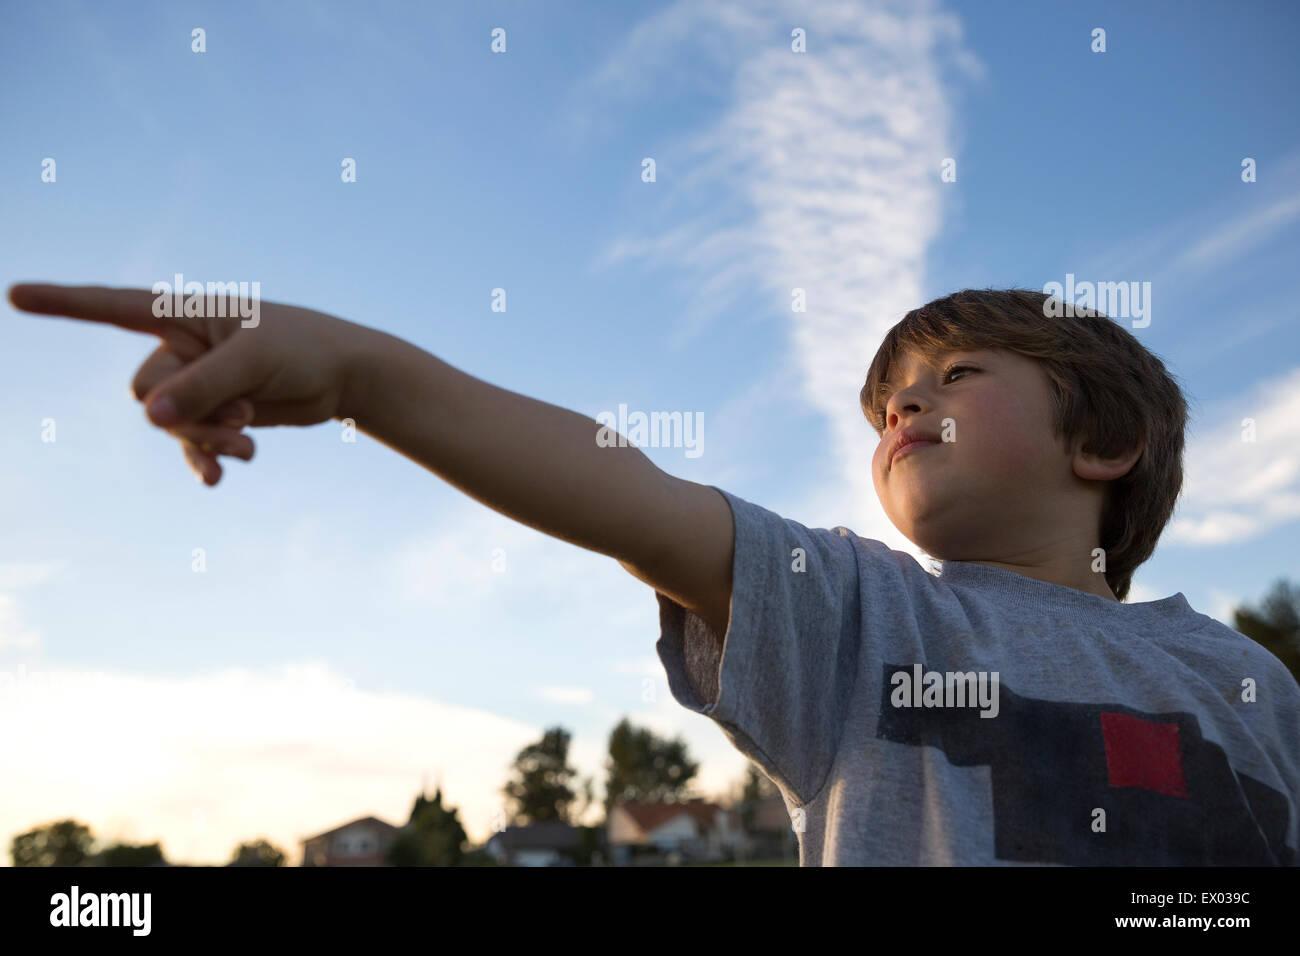 Niedrigen Winkel Blick auf jungen Zeigefinger im park Stockbild